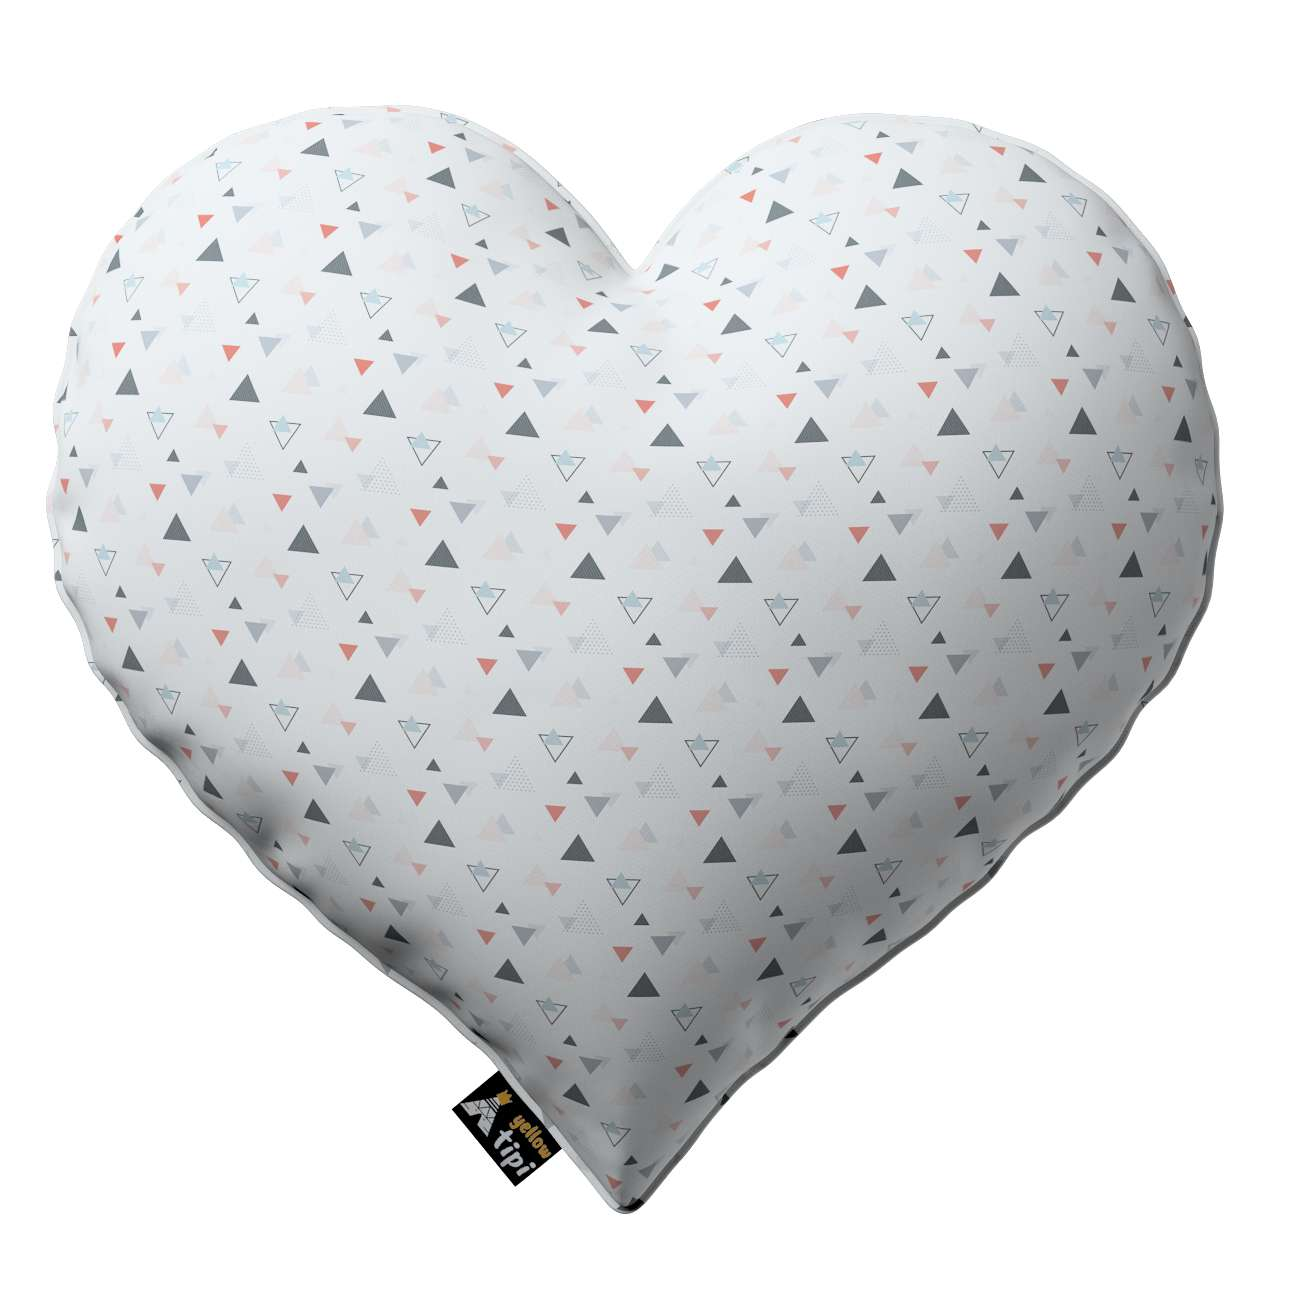 Heart of Love pagalvėlė kolekcijoje Magic Collection, audinys: 500-22